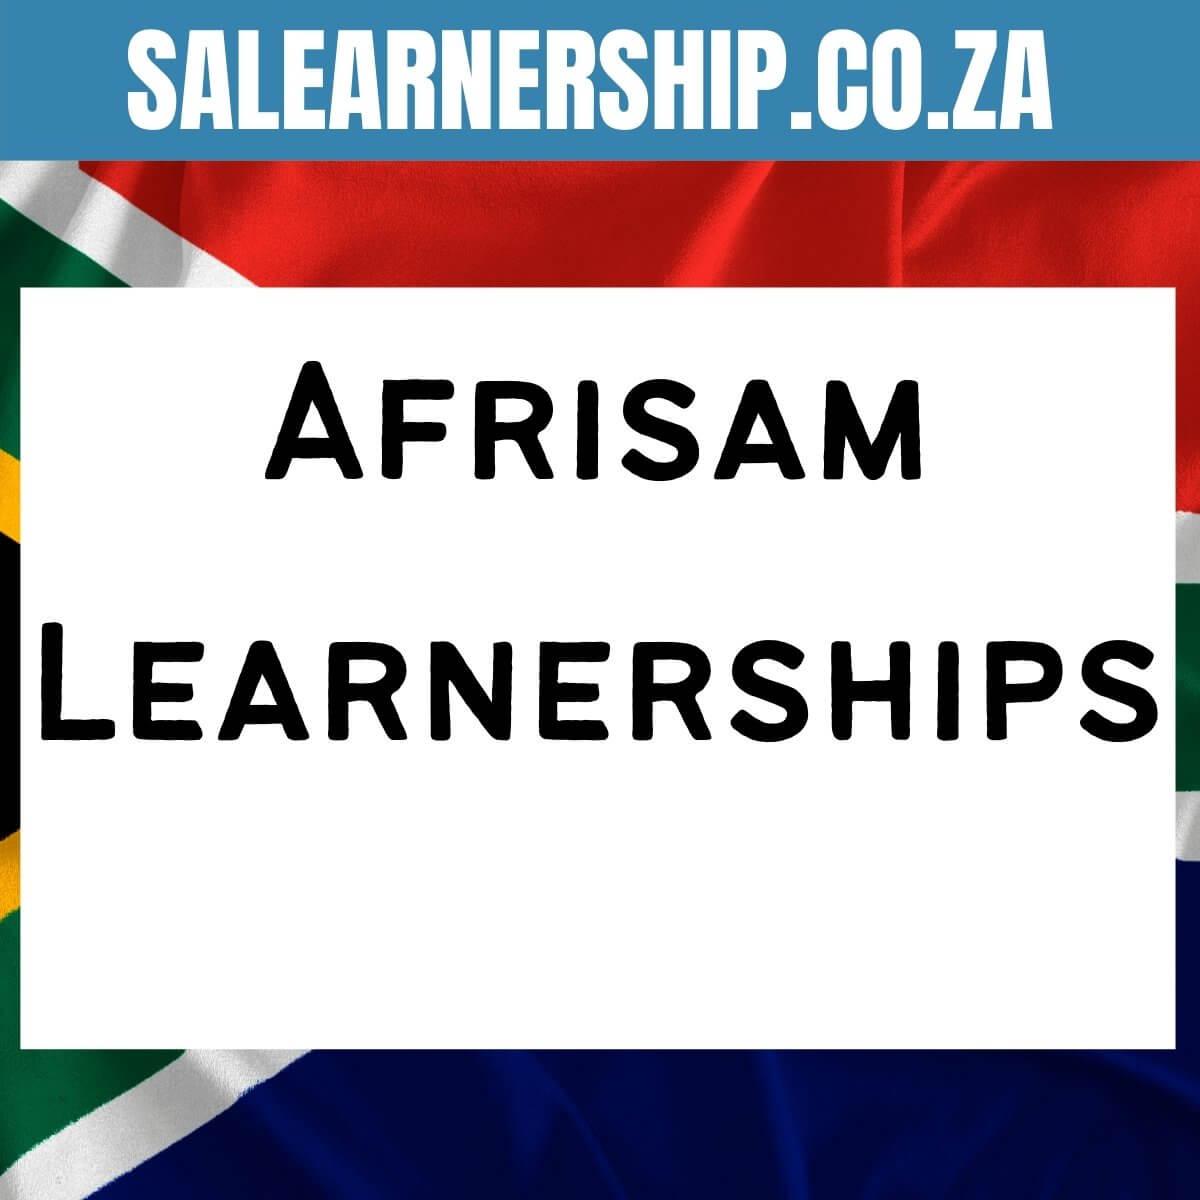 afrisam learnerships